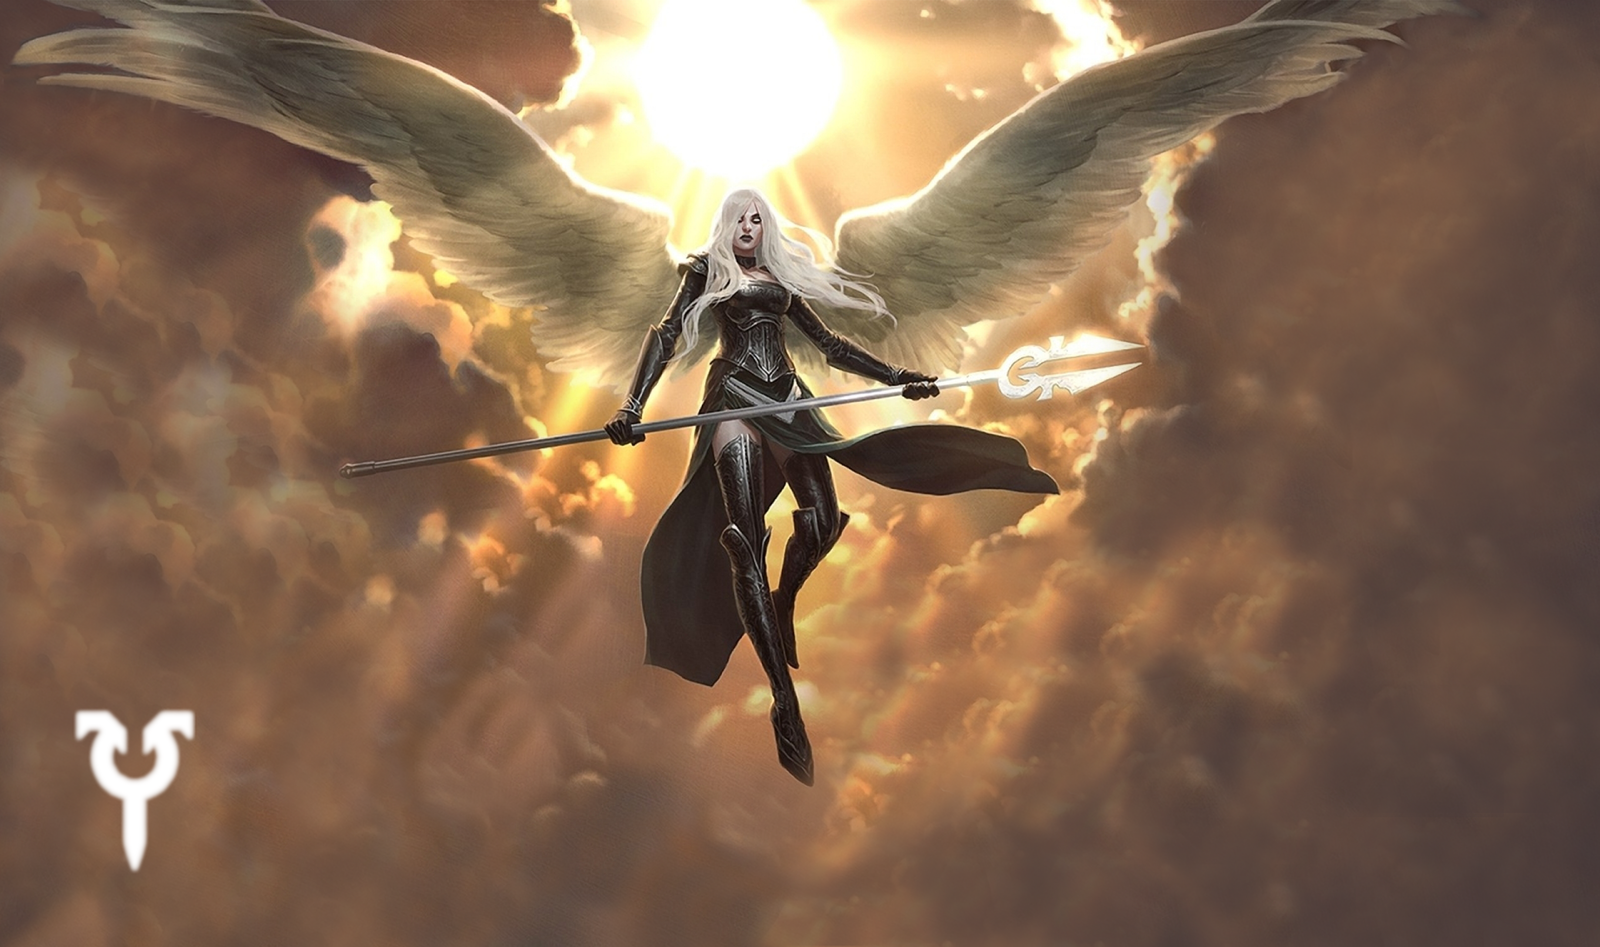 Magic The Gathering Wallpaper Angel Pics Download